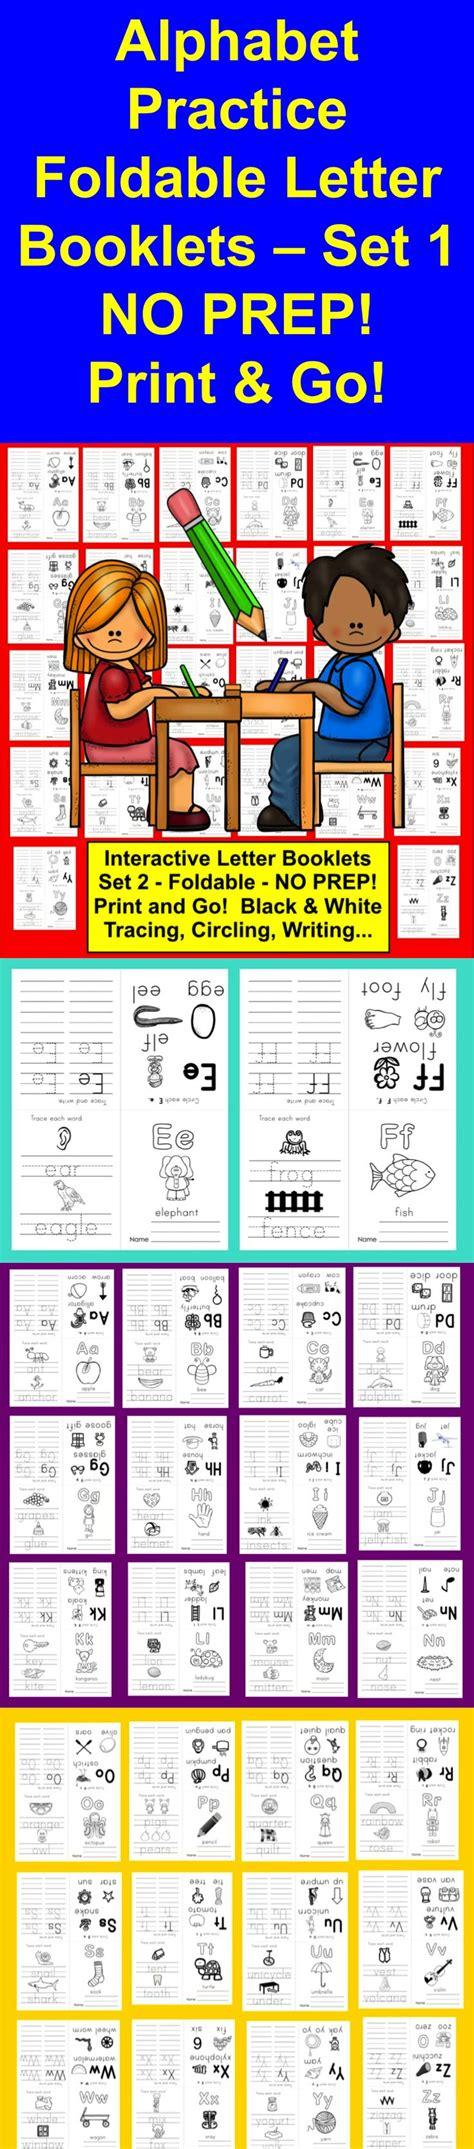 alphabet books  interactive foldable letter booklets